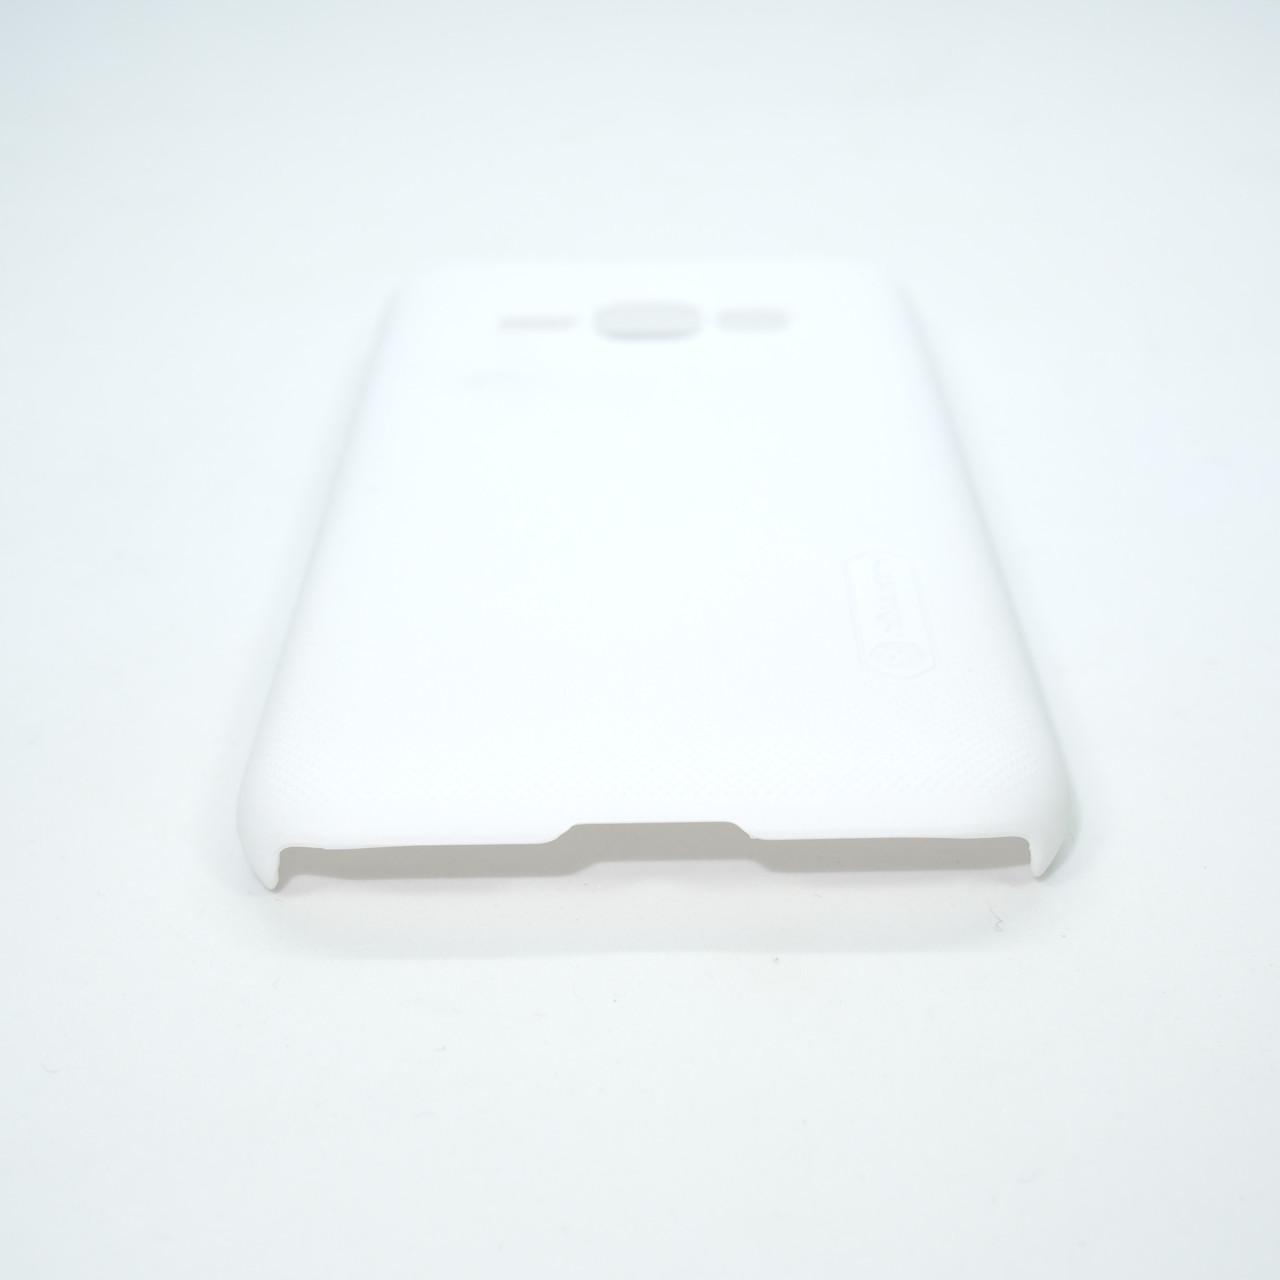 Nillkin Super Frosted Shield Samsung Galaxy J120 white Для телефона